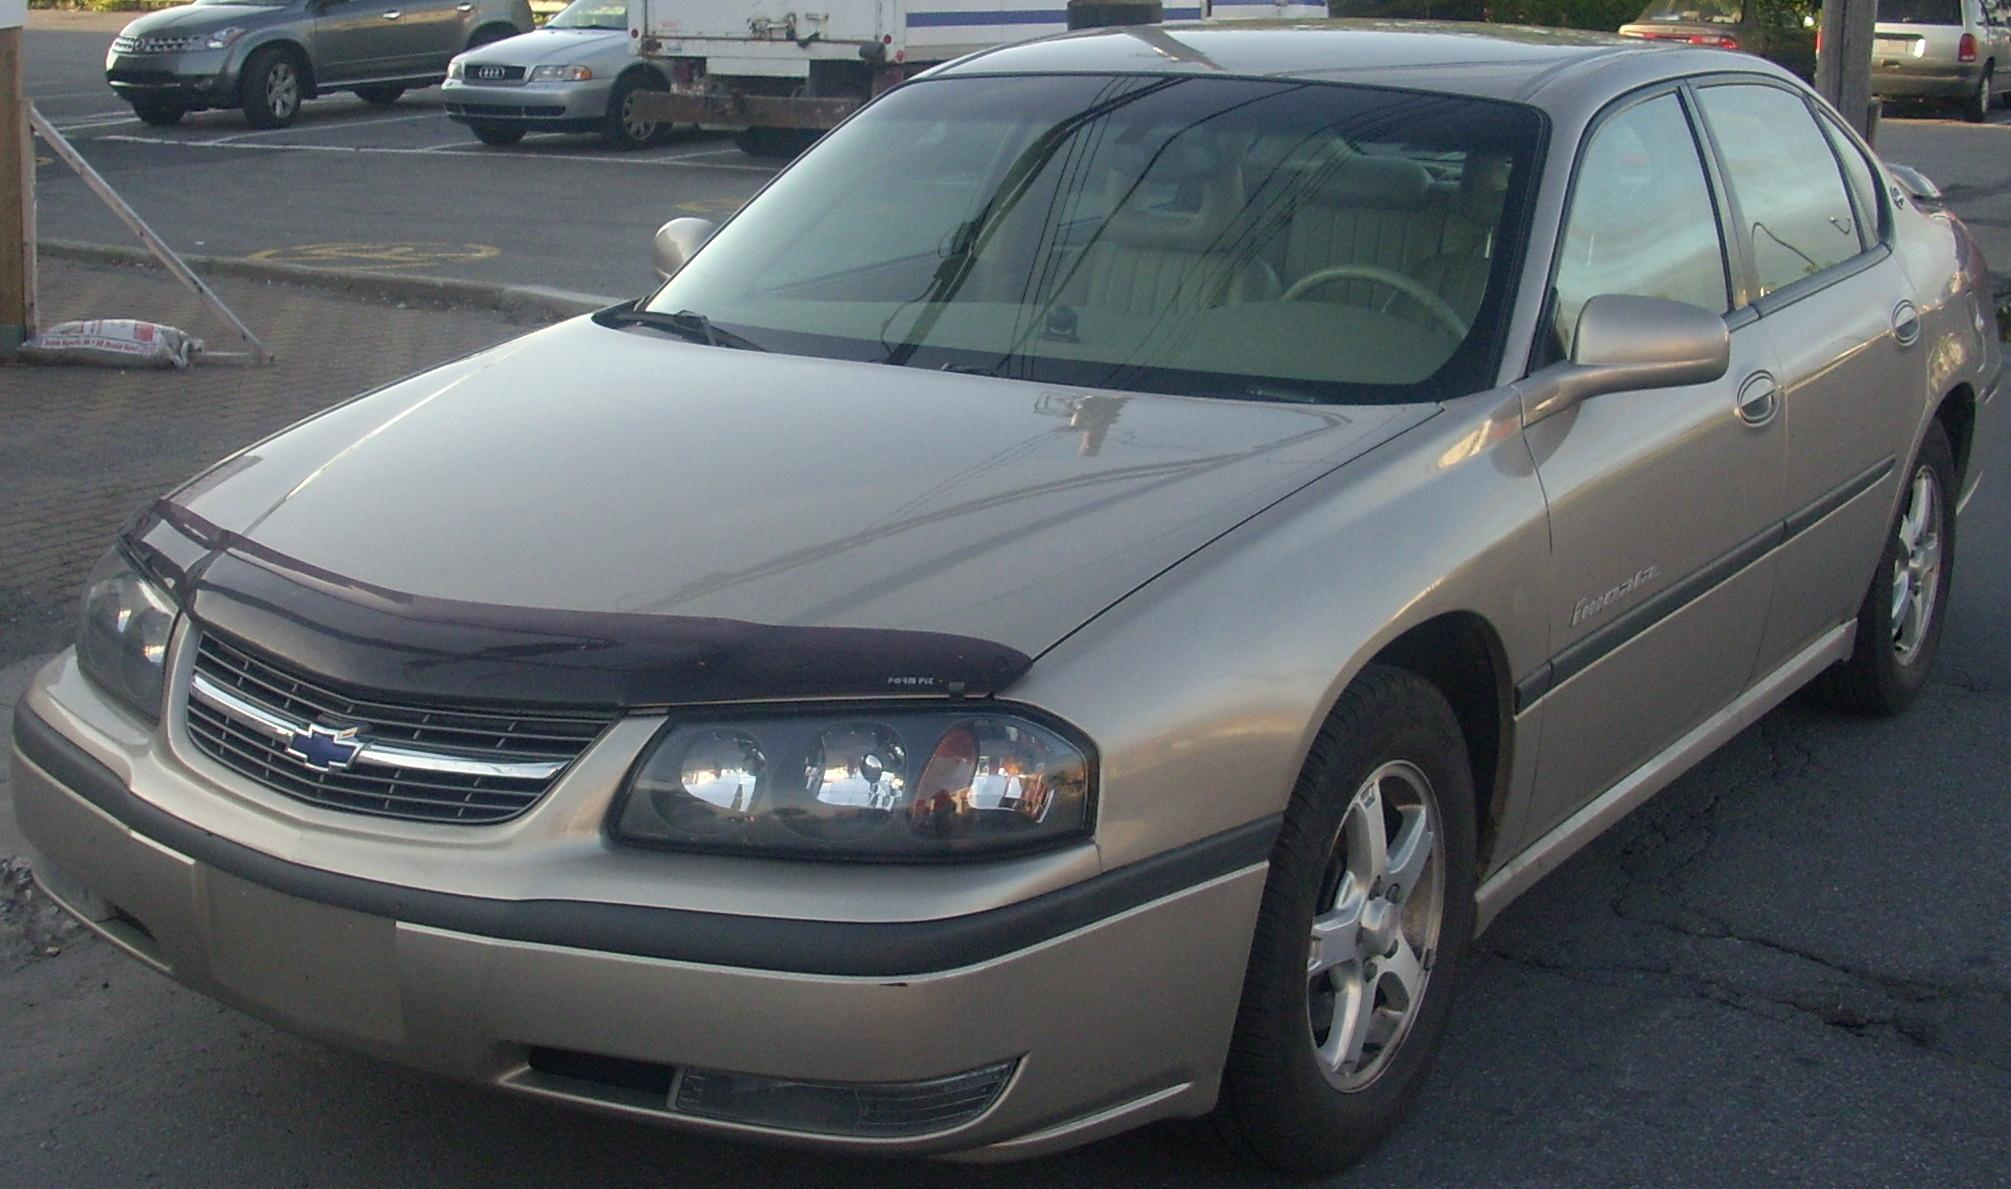 File:2000-2002 Chevrolet Impala.jpg